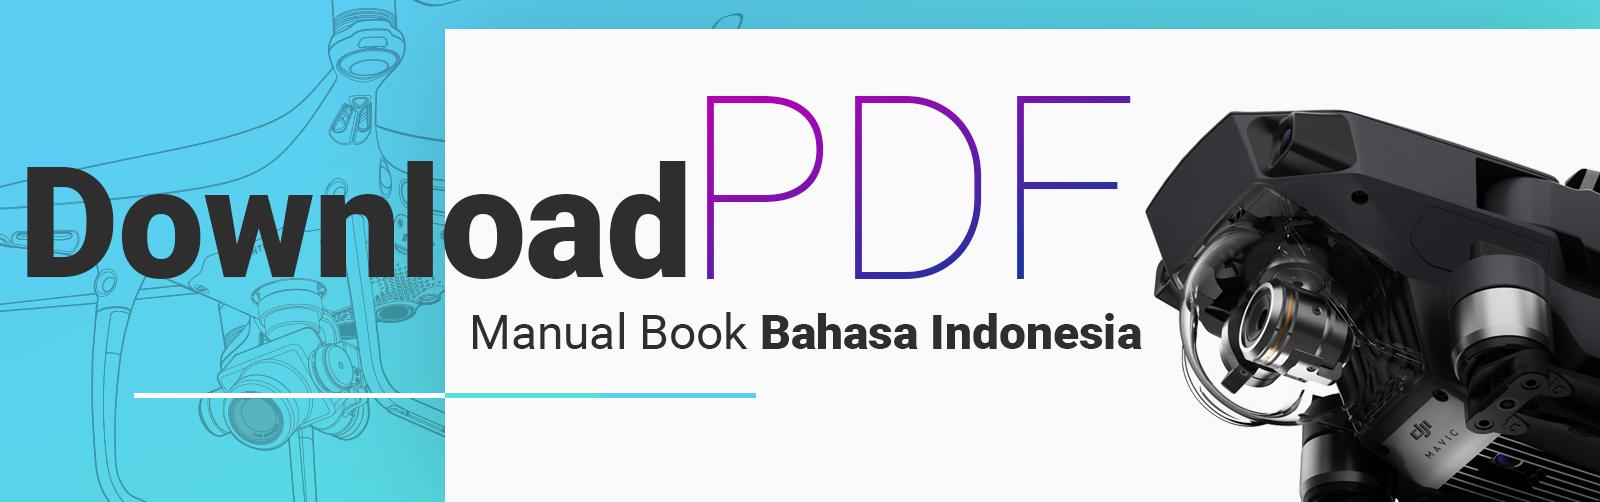 banner-download-pdf.png